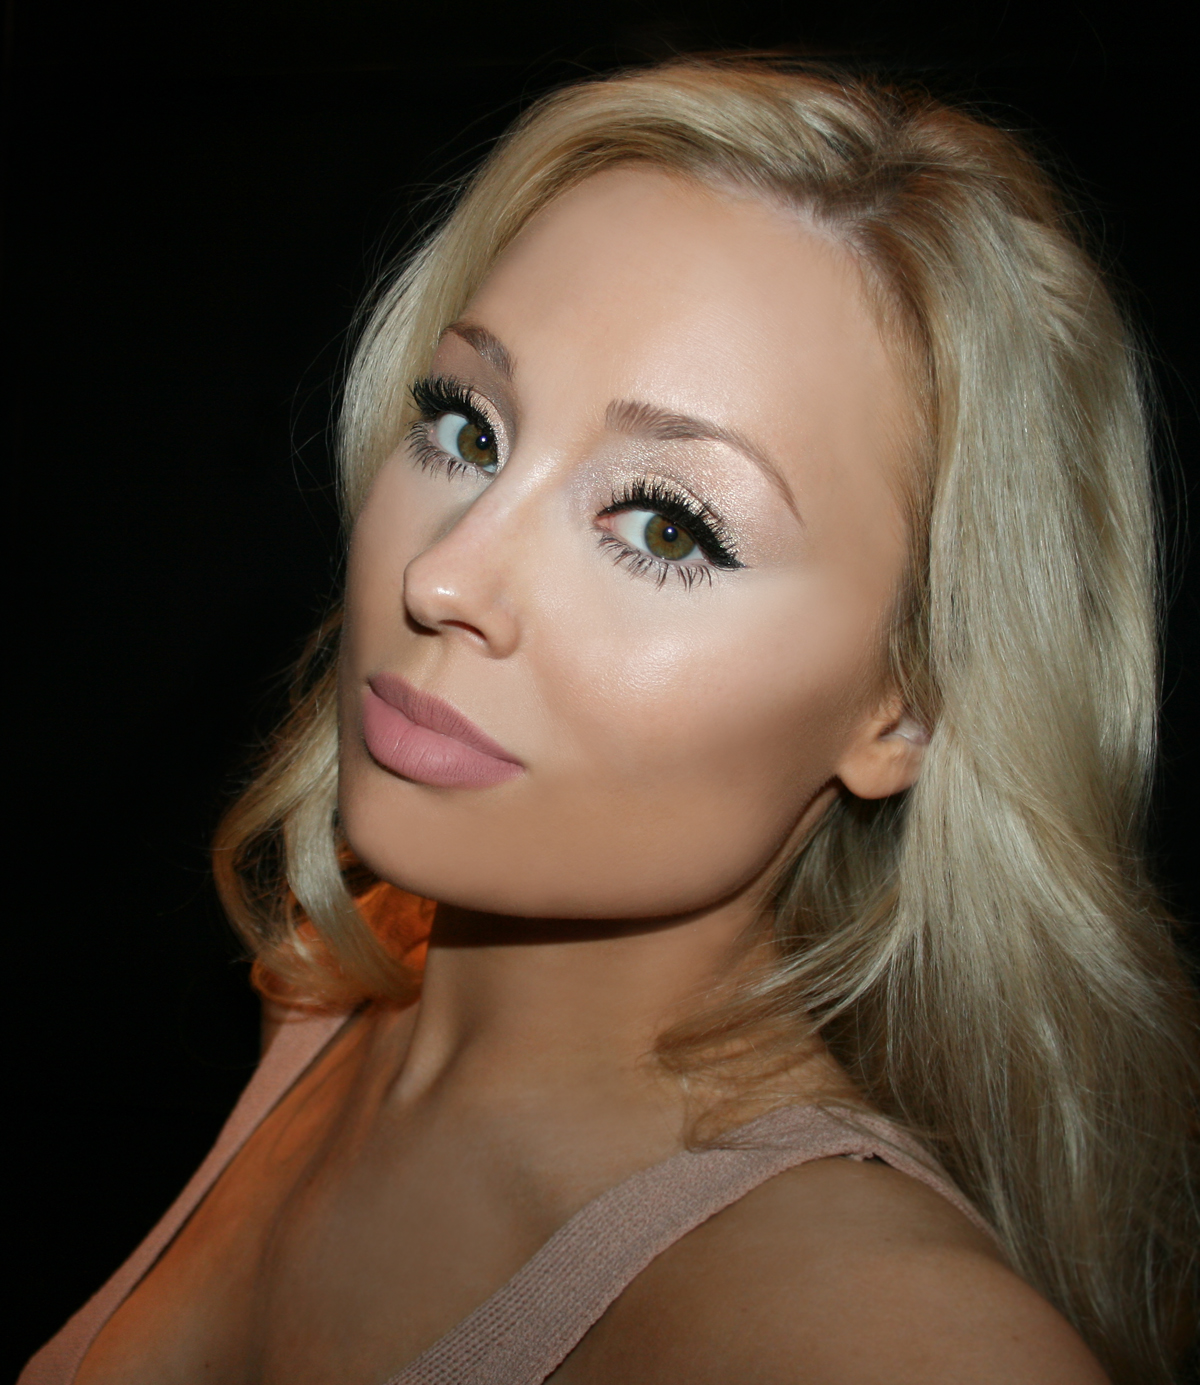 kylie cosmetics lipkit koko k tutorial kim kardashian